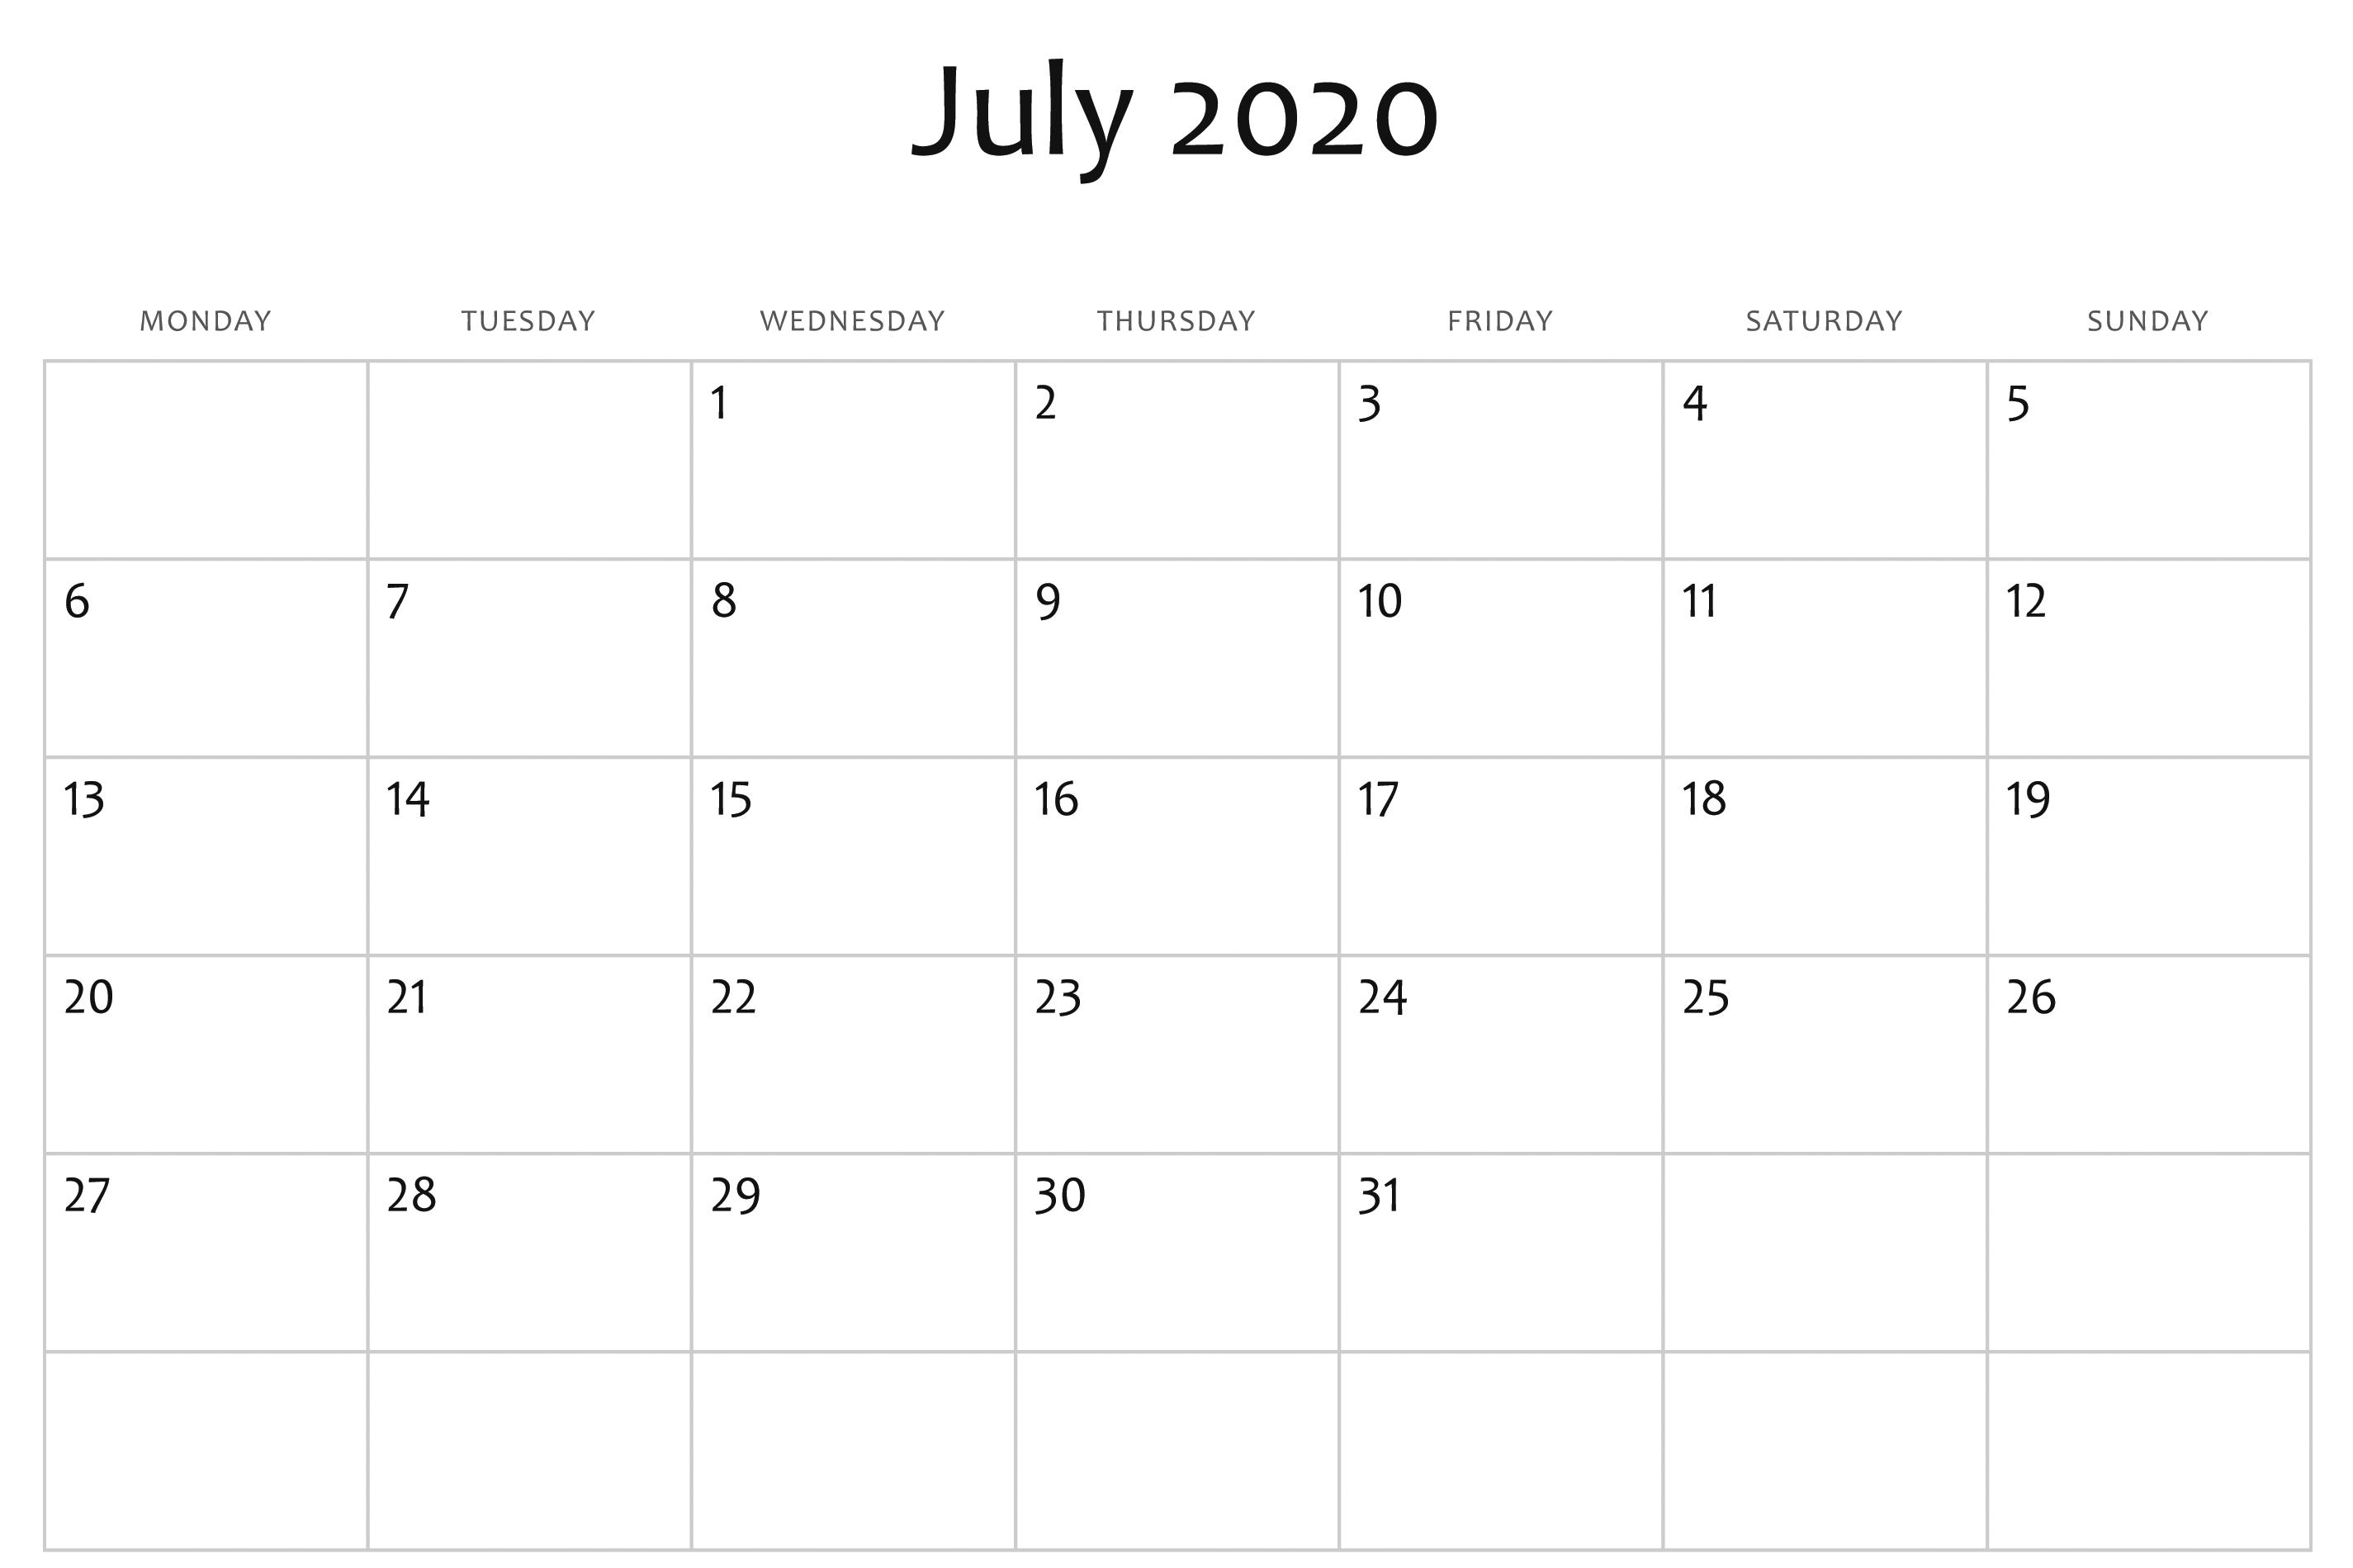 July 2020 Calendar Word | Printable Calendar Template, July